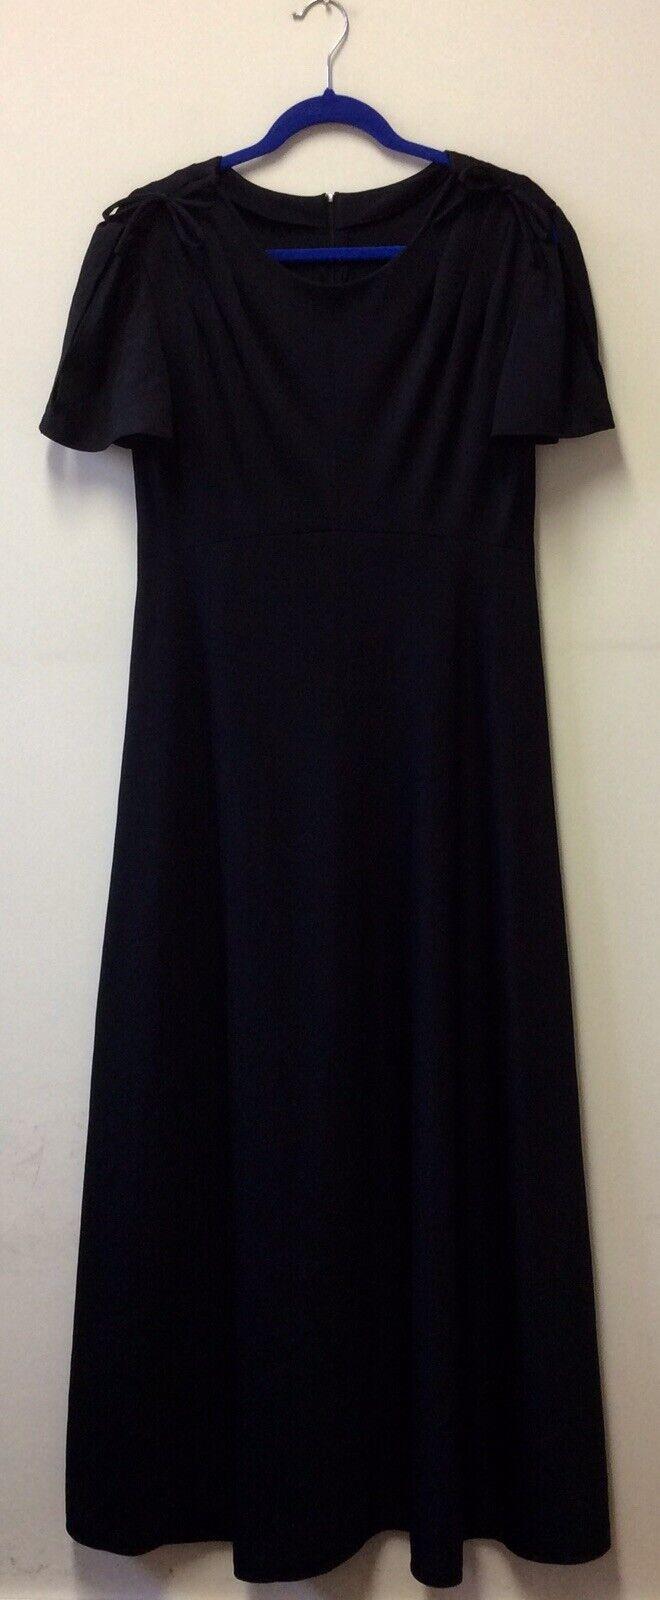 1970s Black Polyester Jersey Maxi Dress UK 12